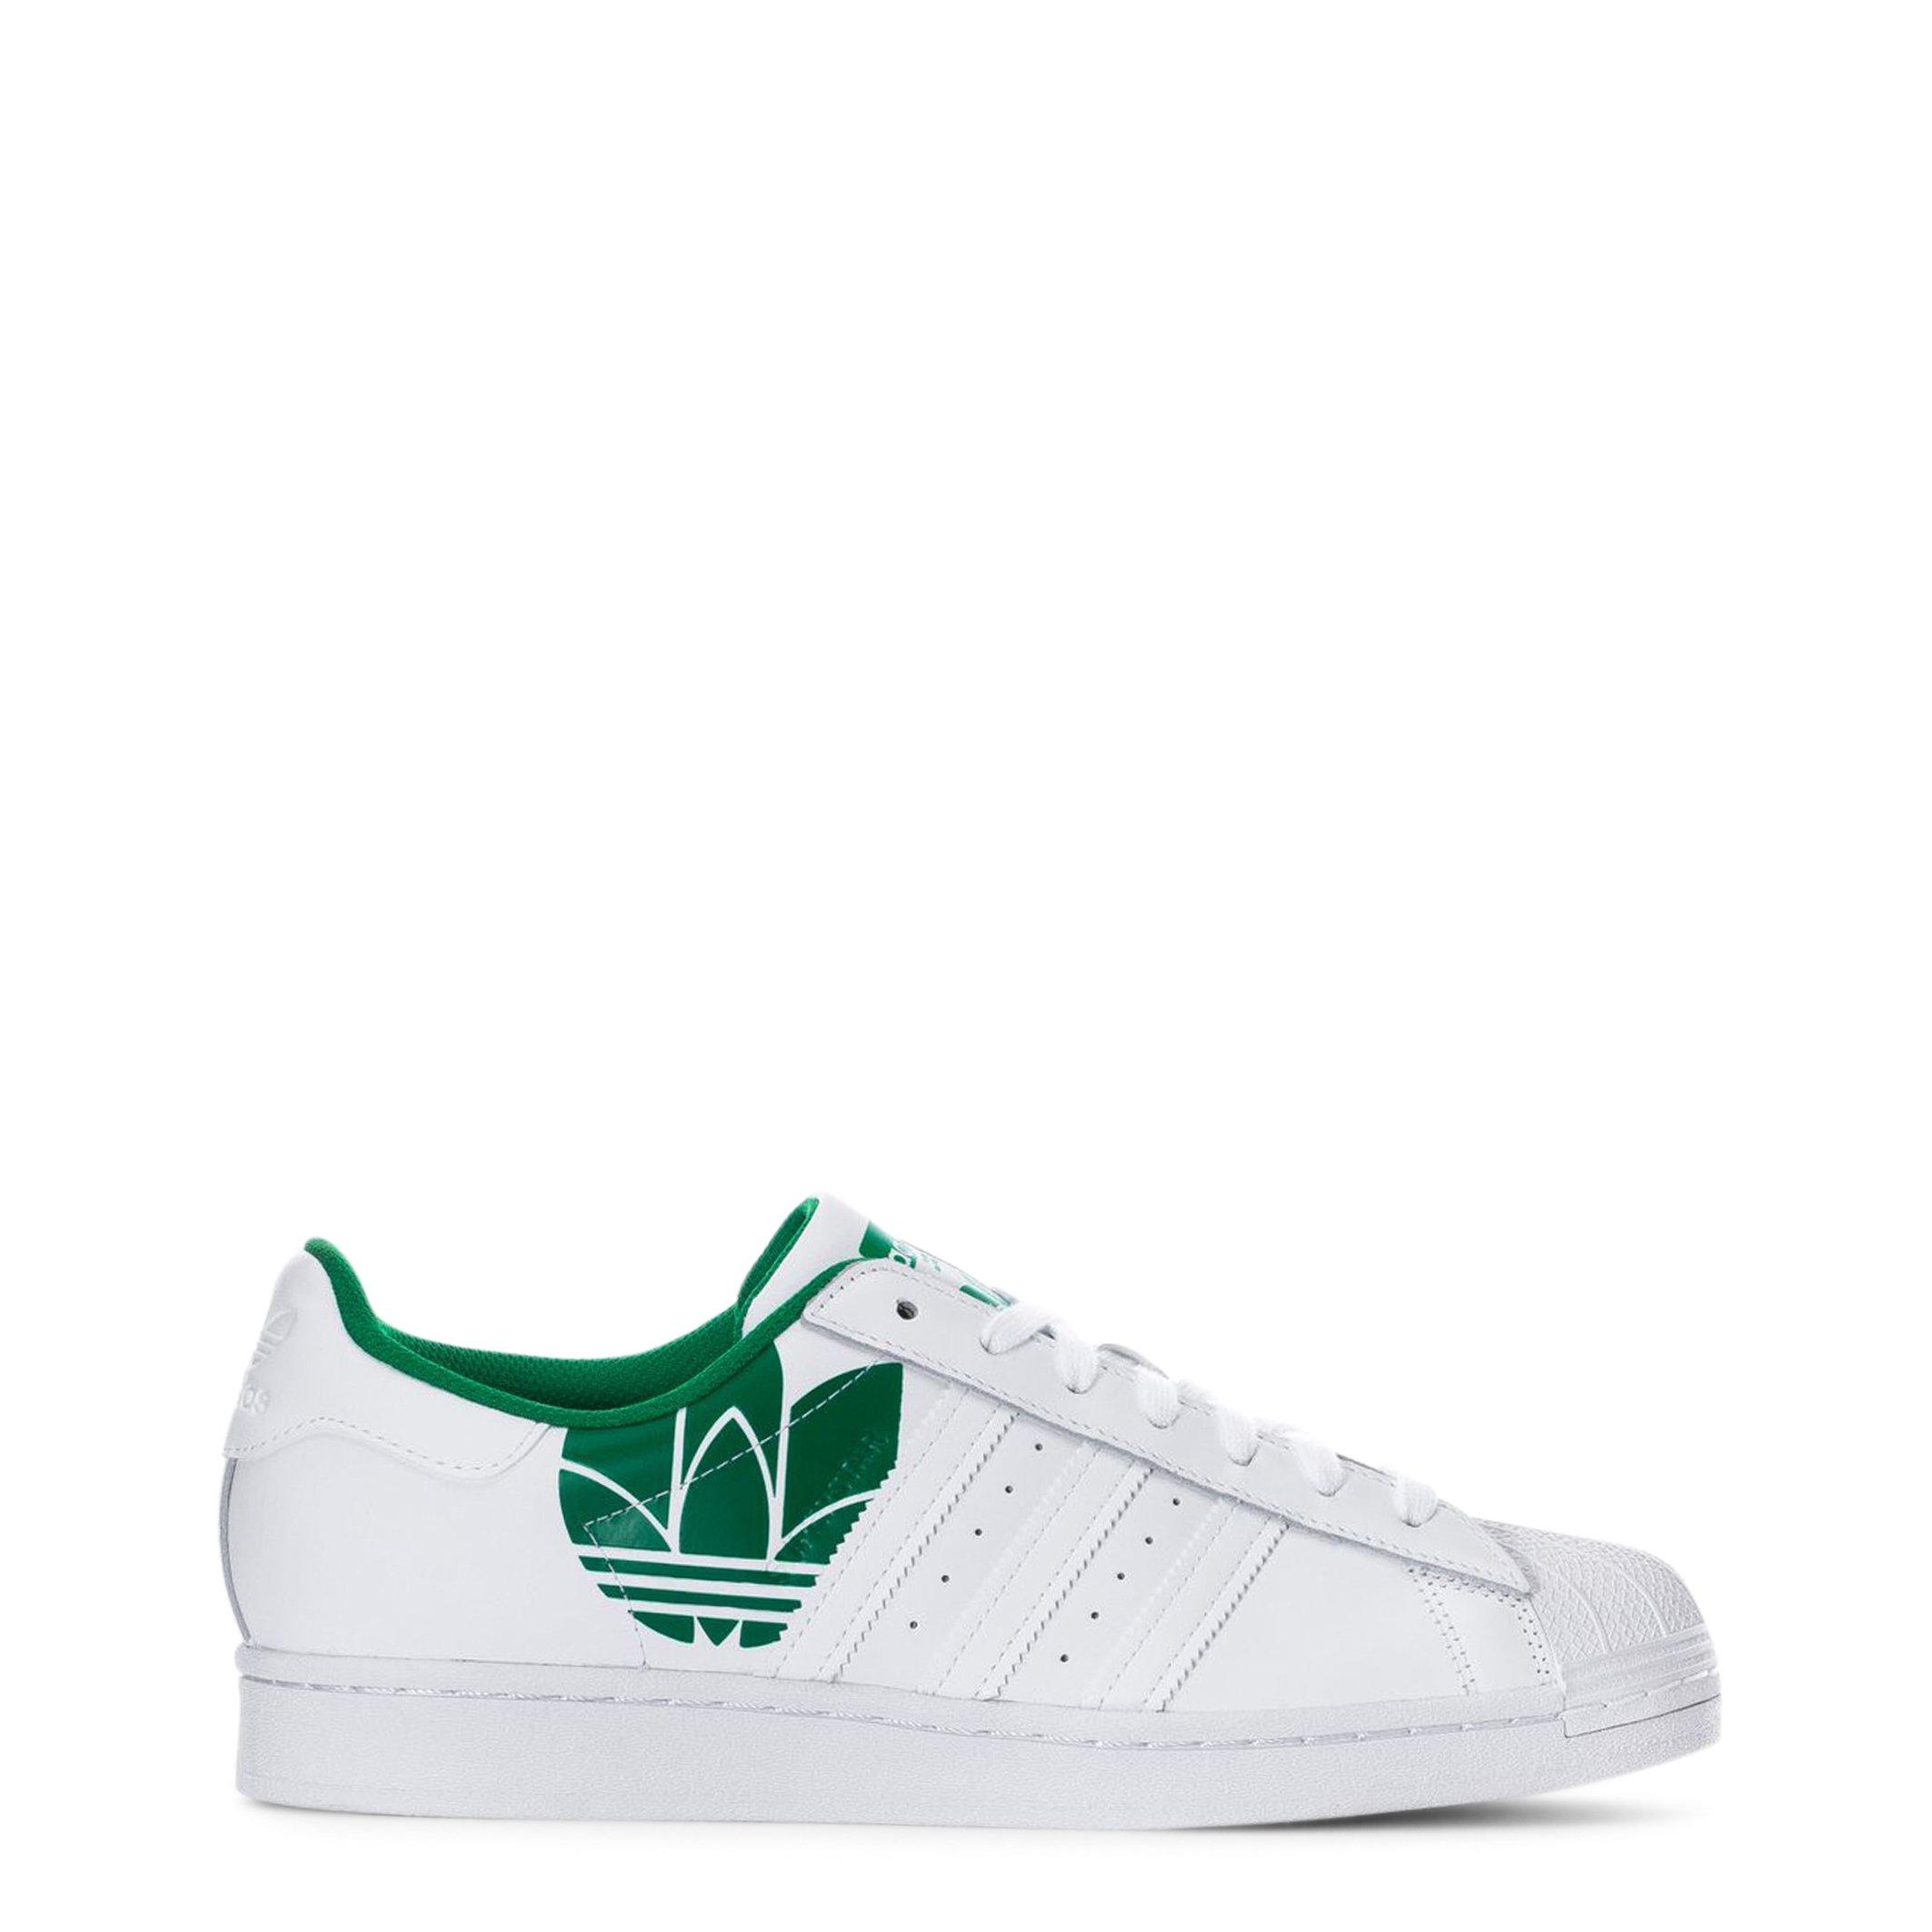 Adidas Women's Trainer Various Colours Superstar - white-2 UK 3.5